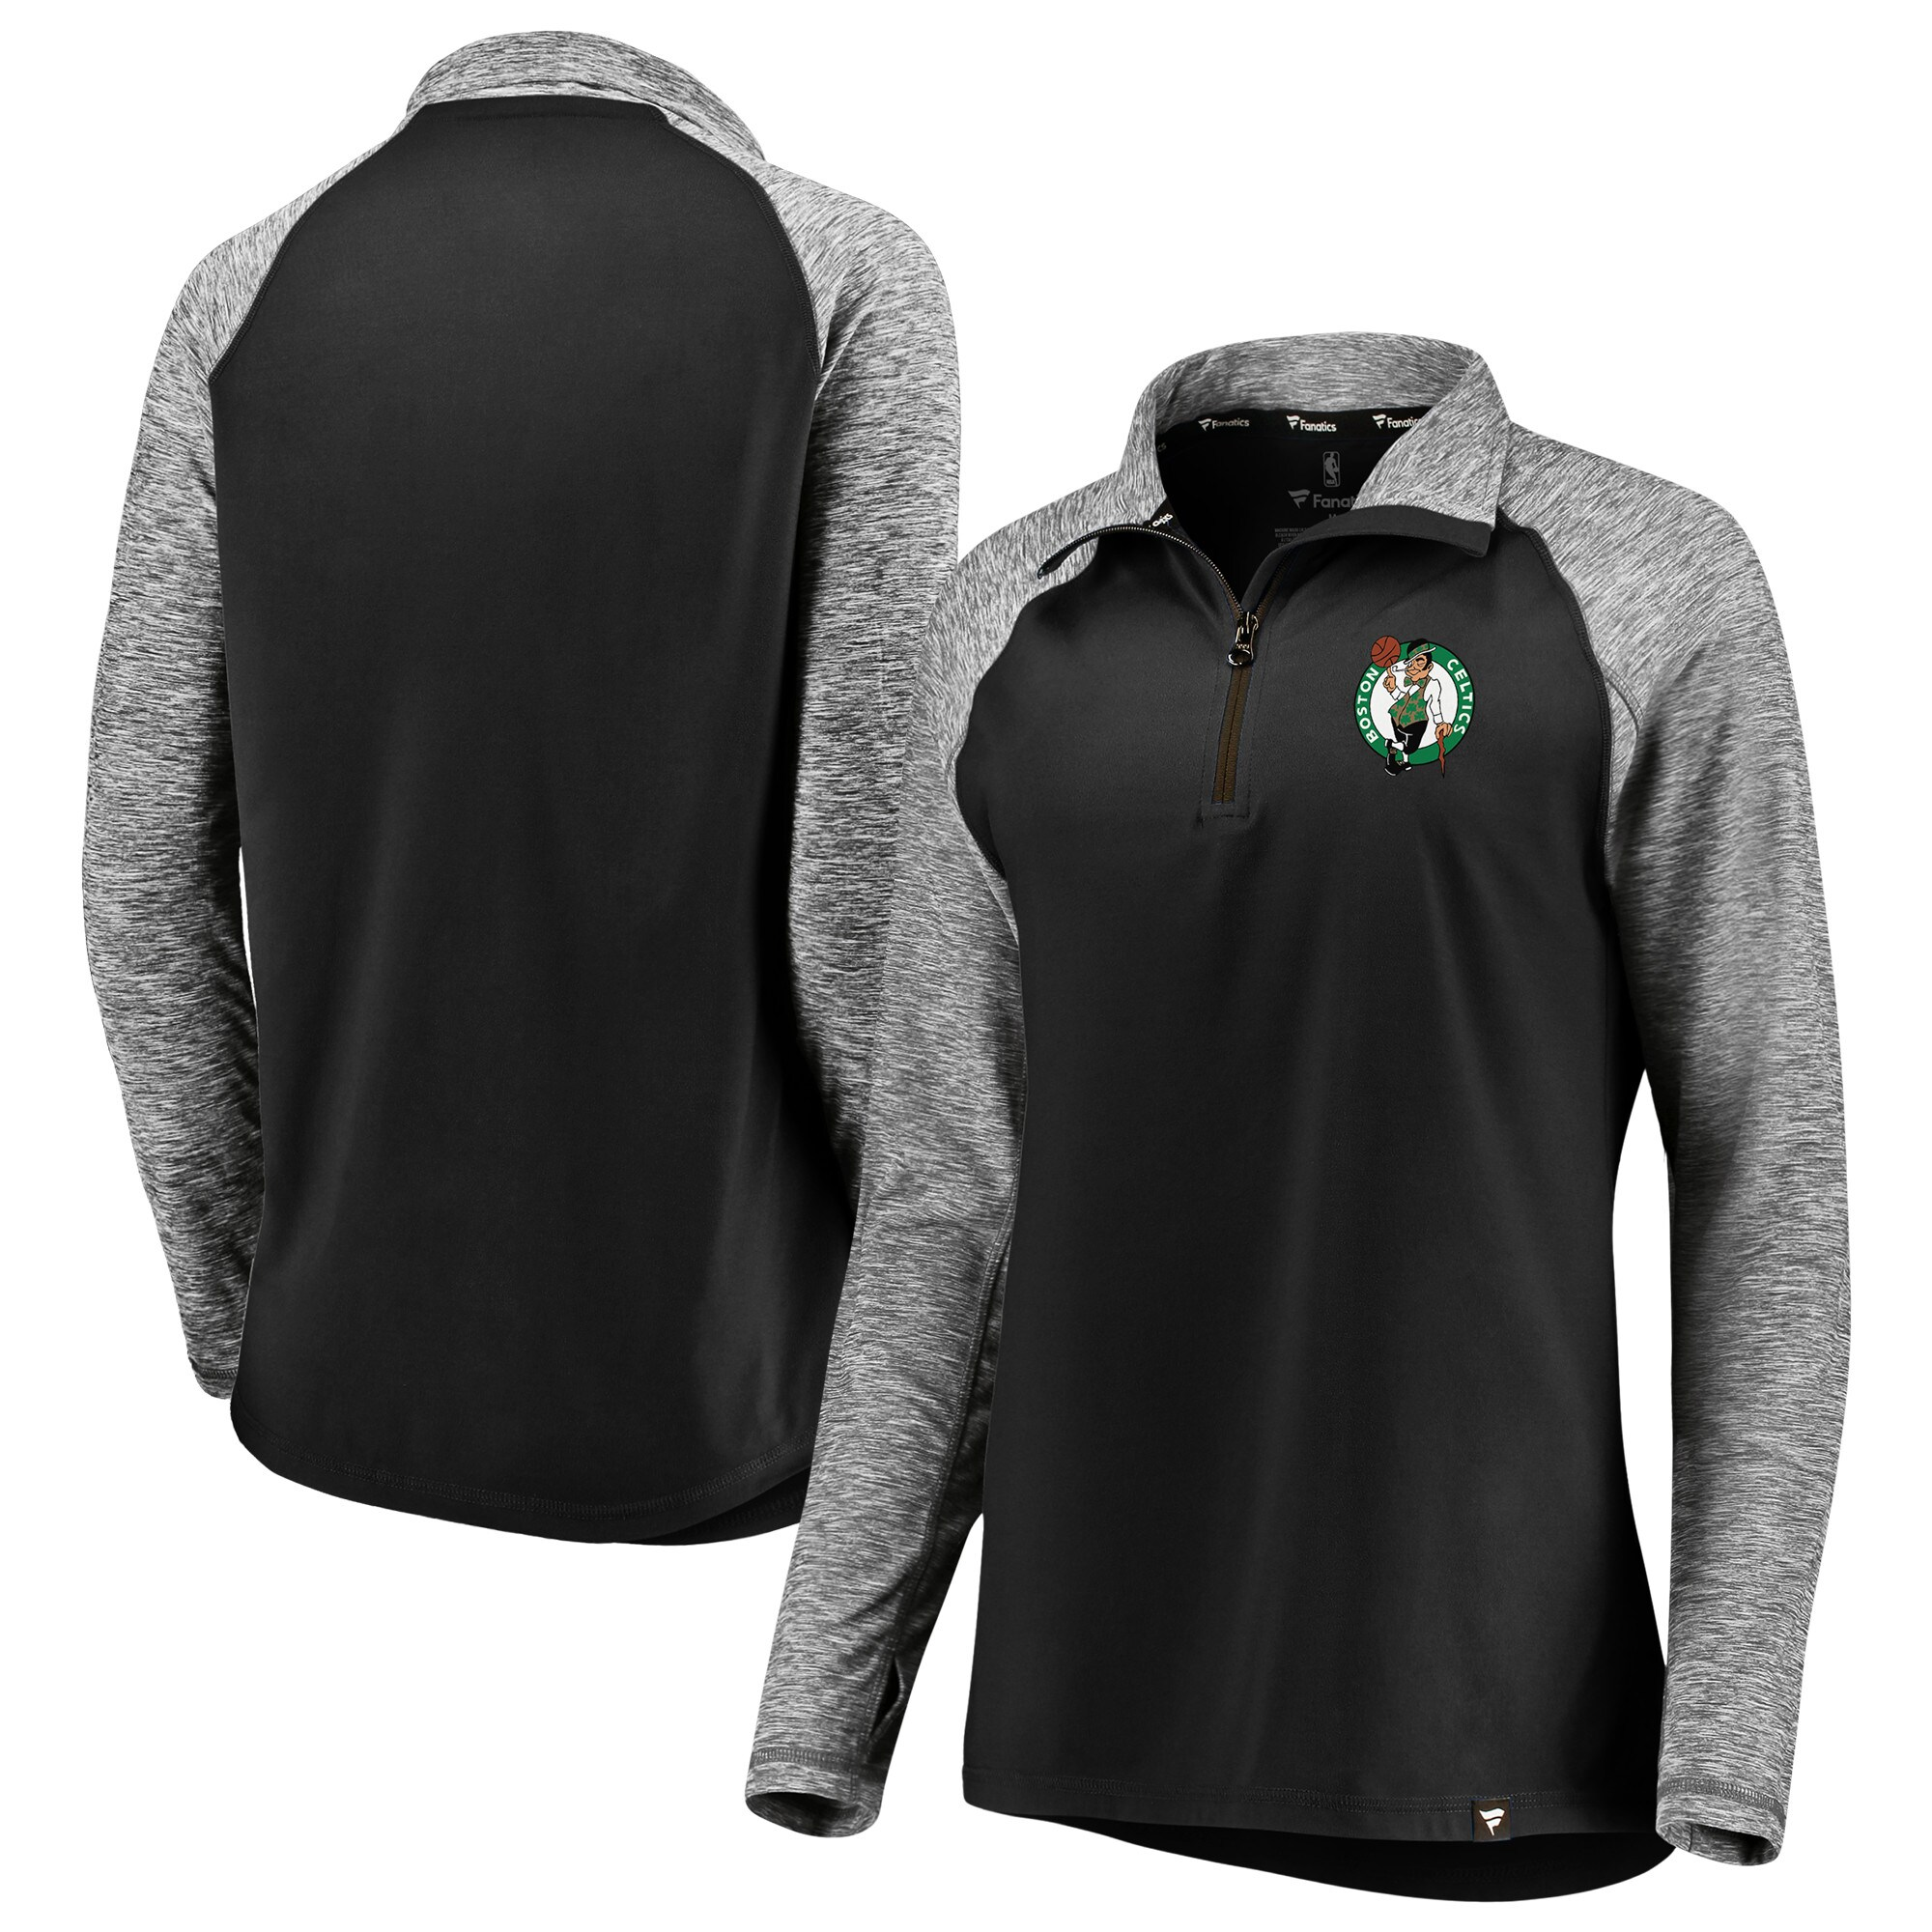 Boston Celtics Fanatics Branded Women's Made to Move Static Performance Raglan Sleeve Quarter-Zip Pullover Jacket - Black/Heathered Black